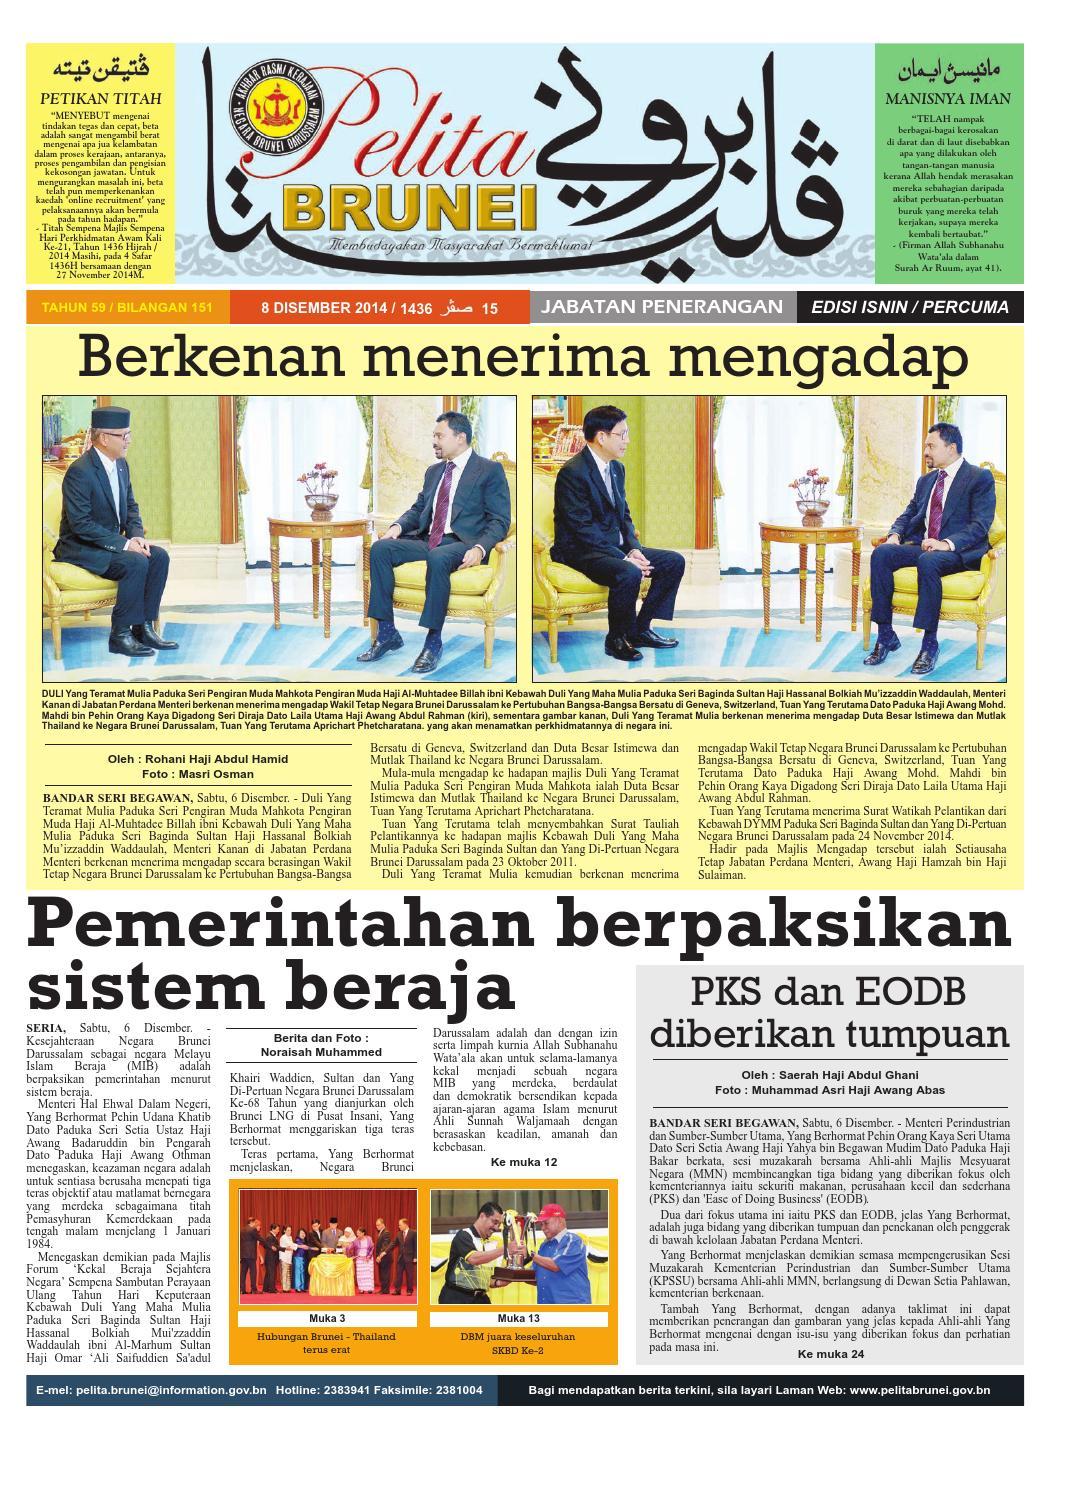 Pelita Brunei Isnin 8 Dis 2014 By Putera Katak Brunei Issuu